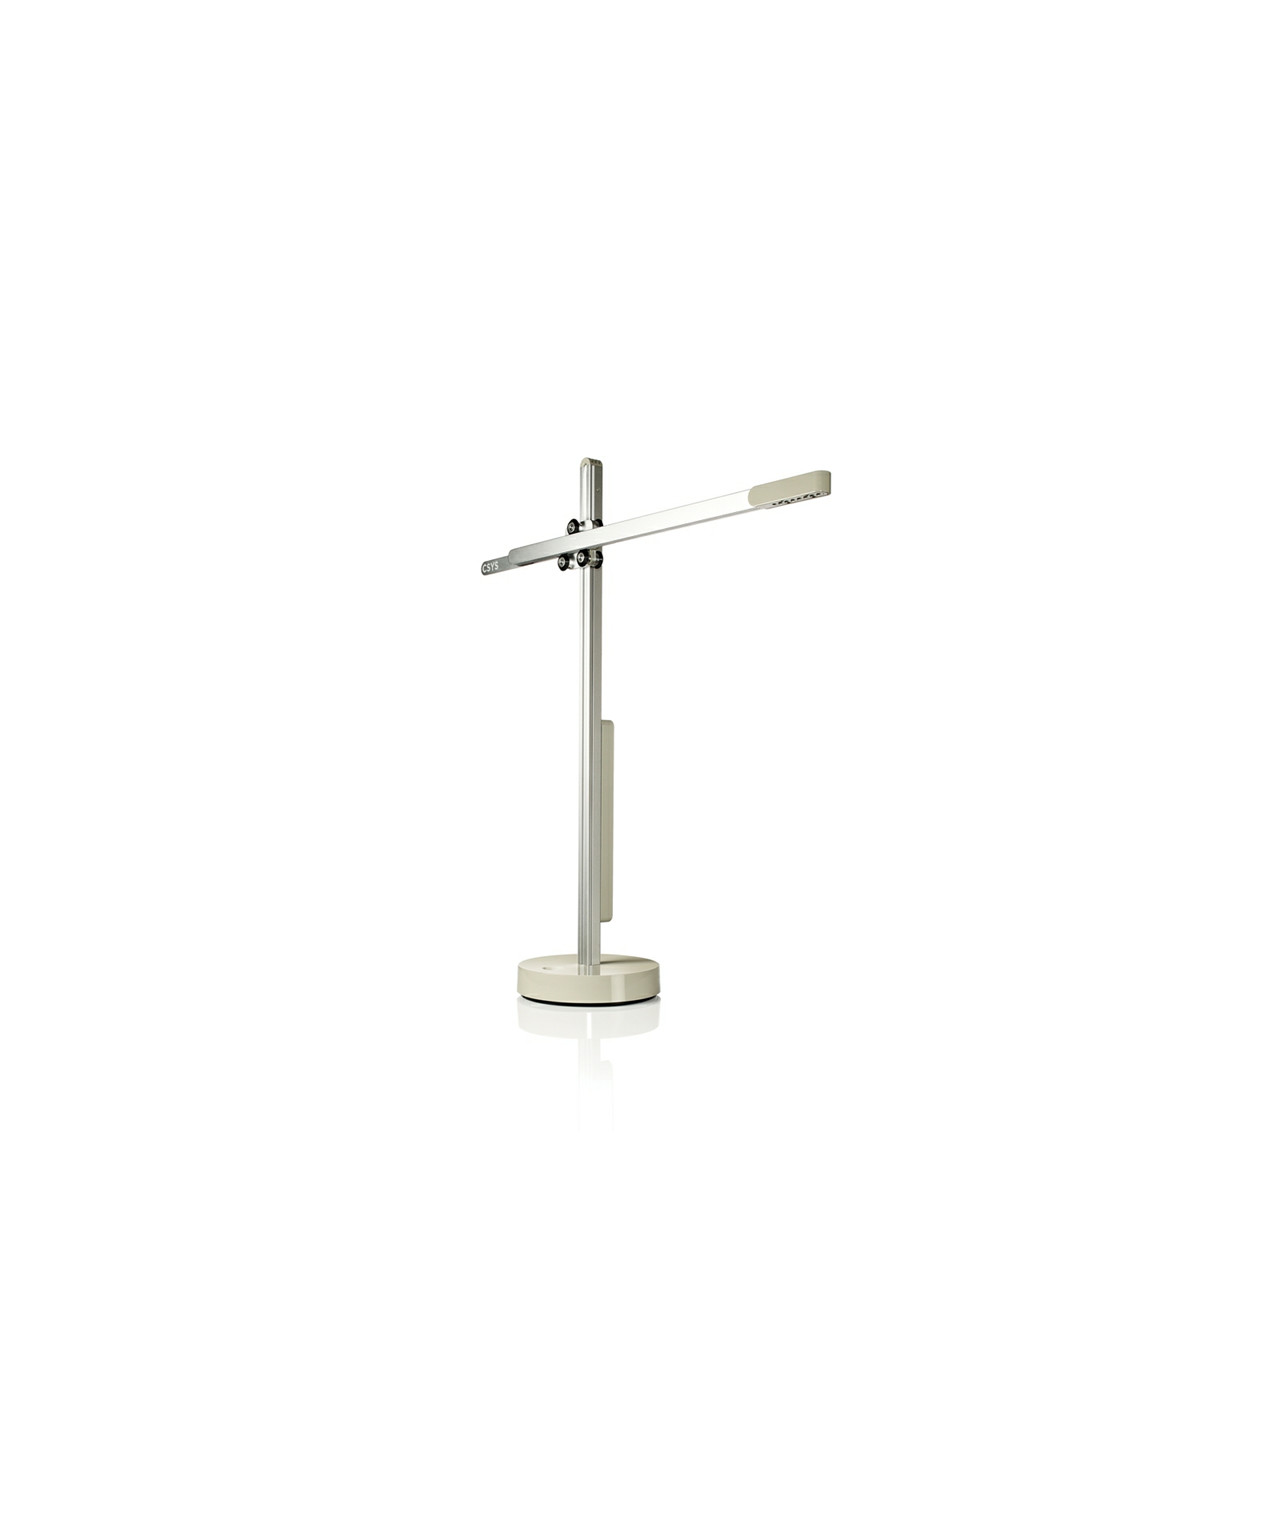 Csys bordlampe sølv/grå